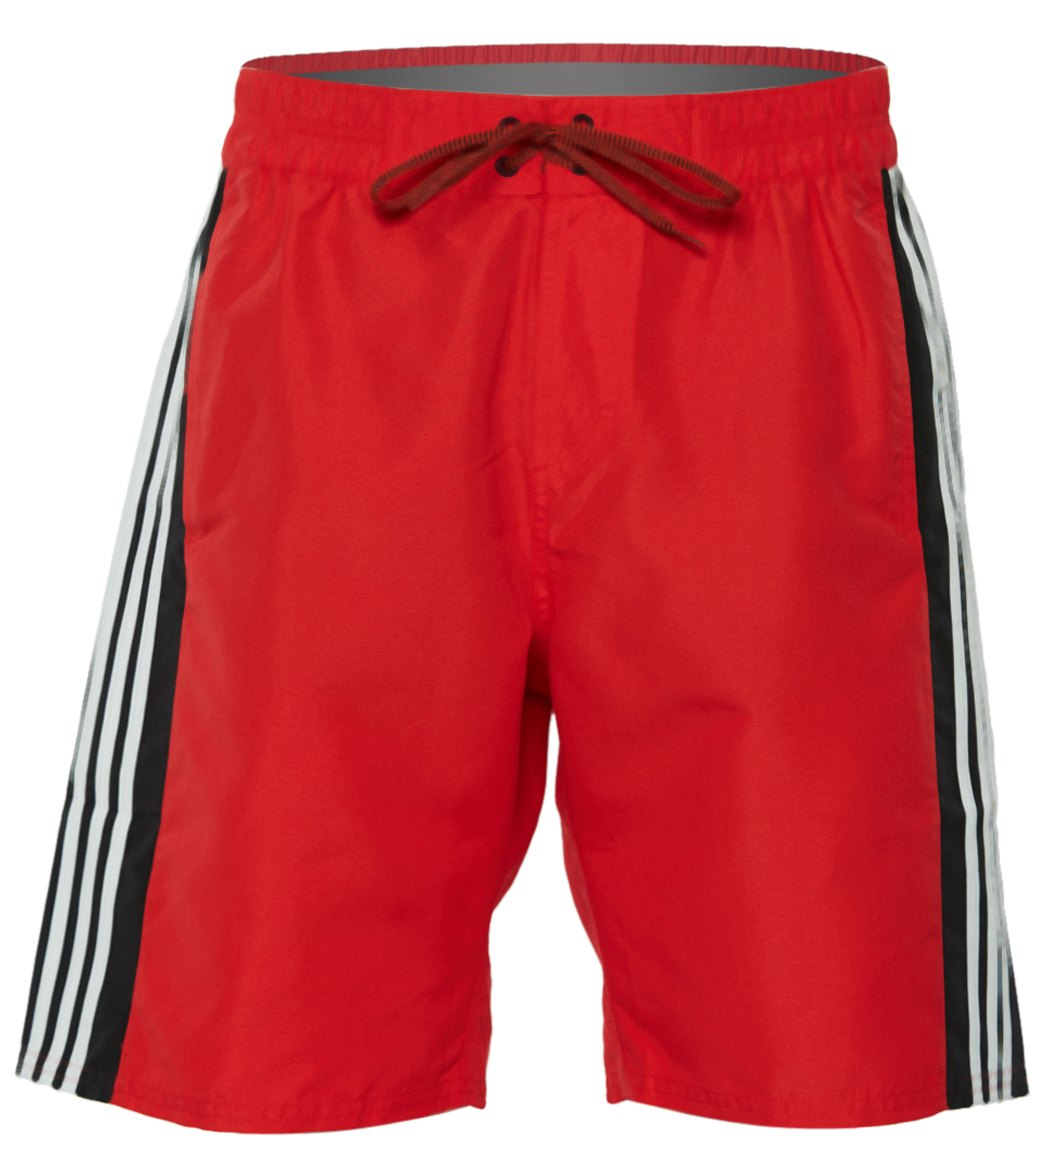 9d49786011 Adidas Hoopshot 21